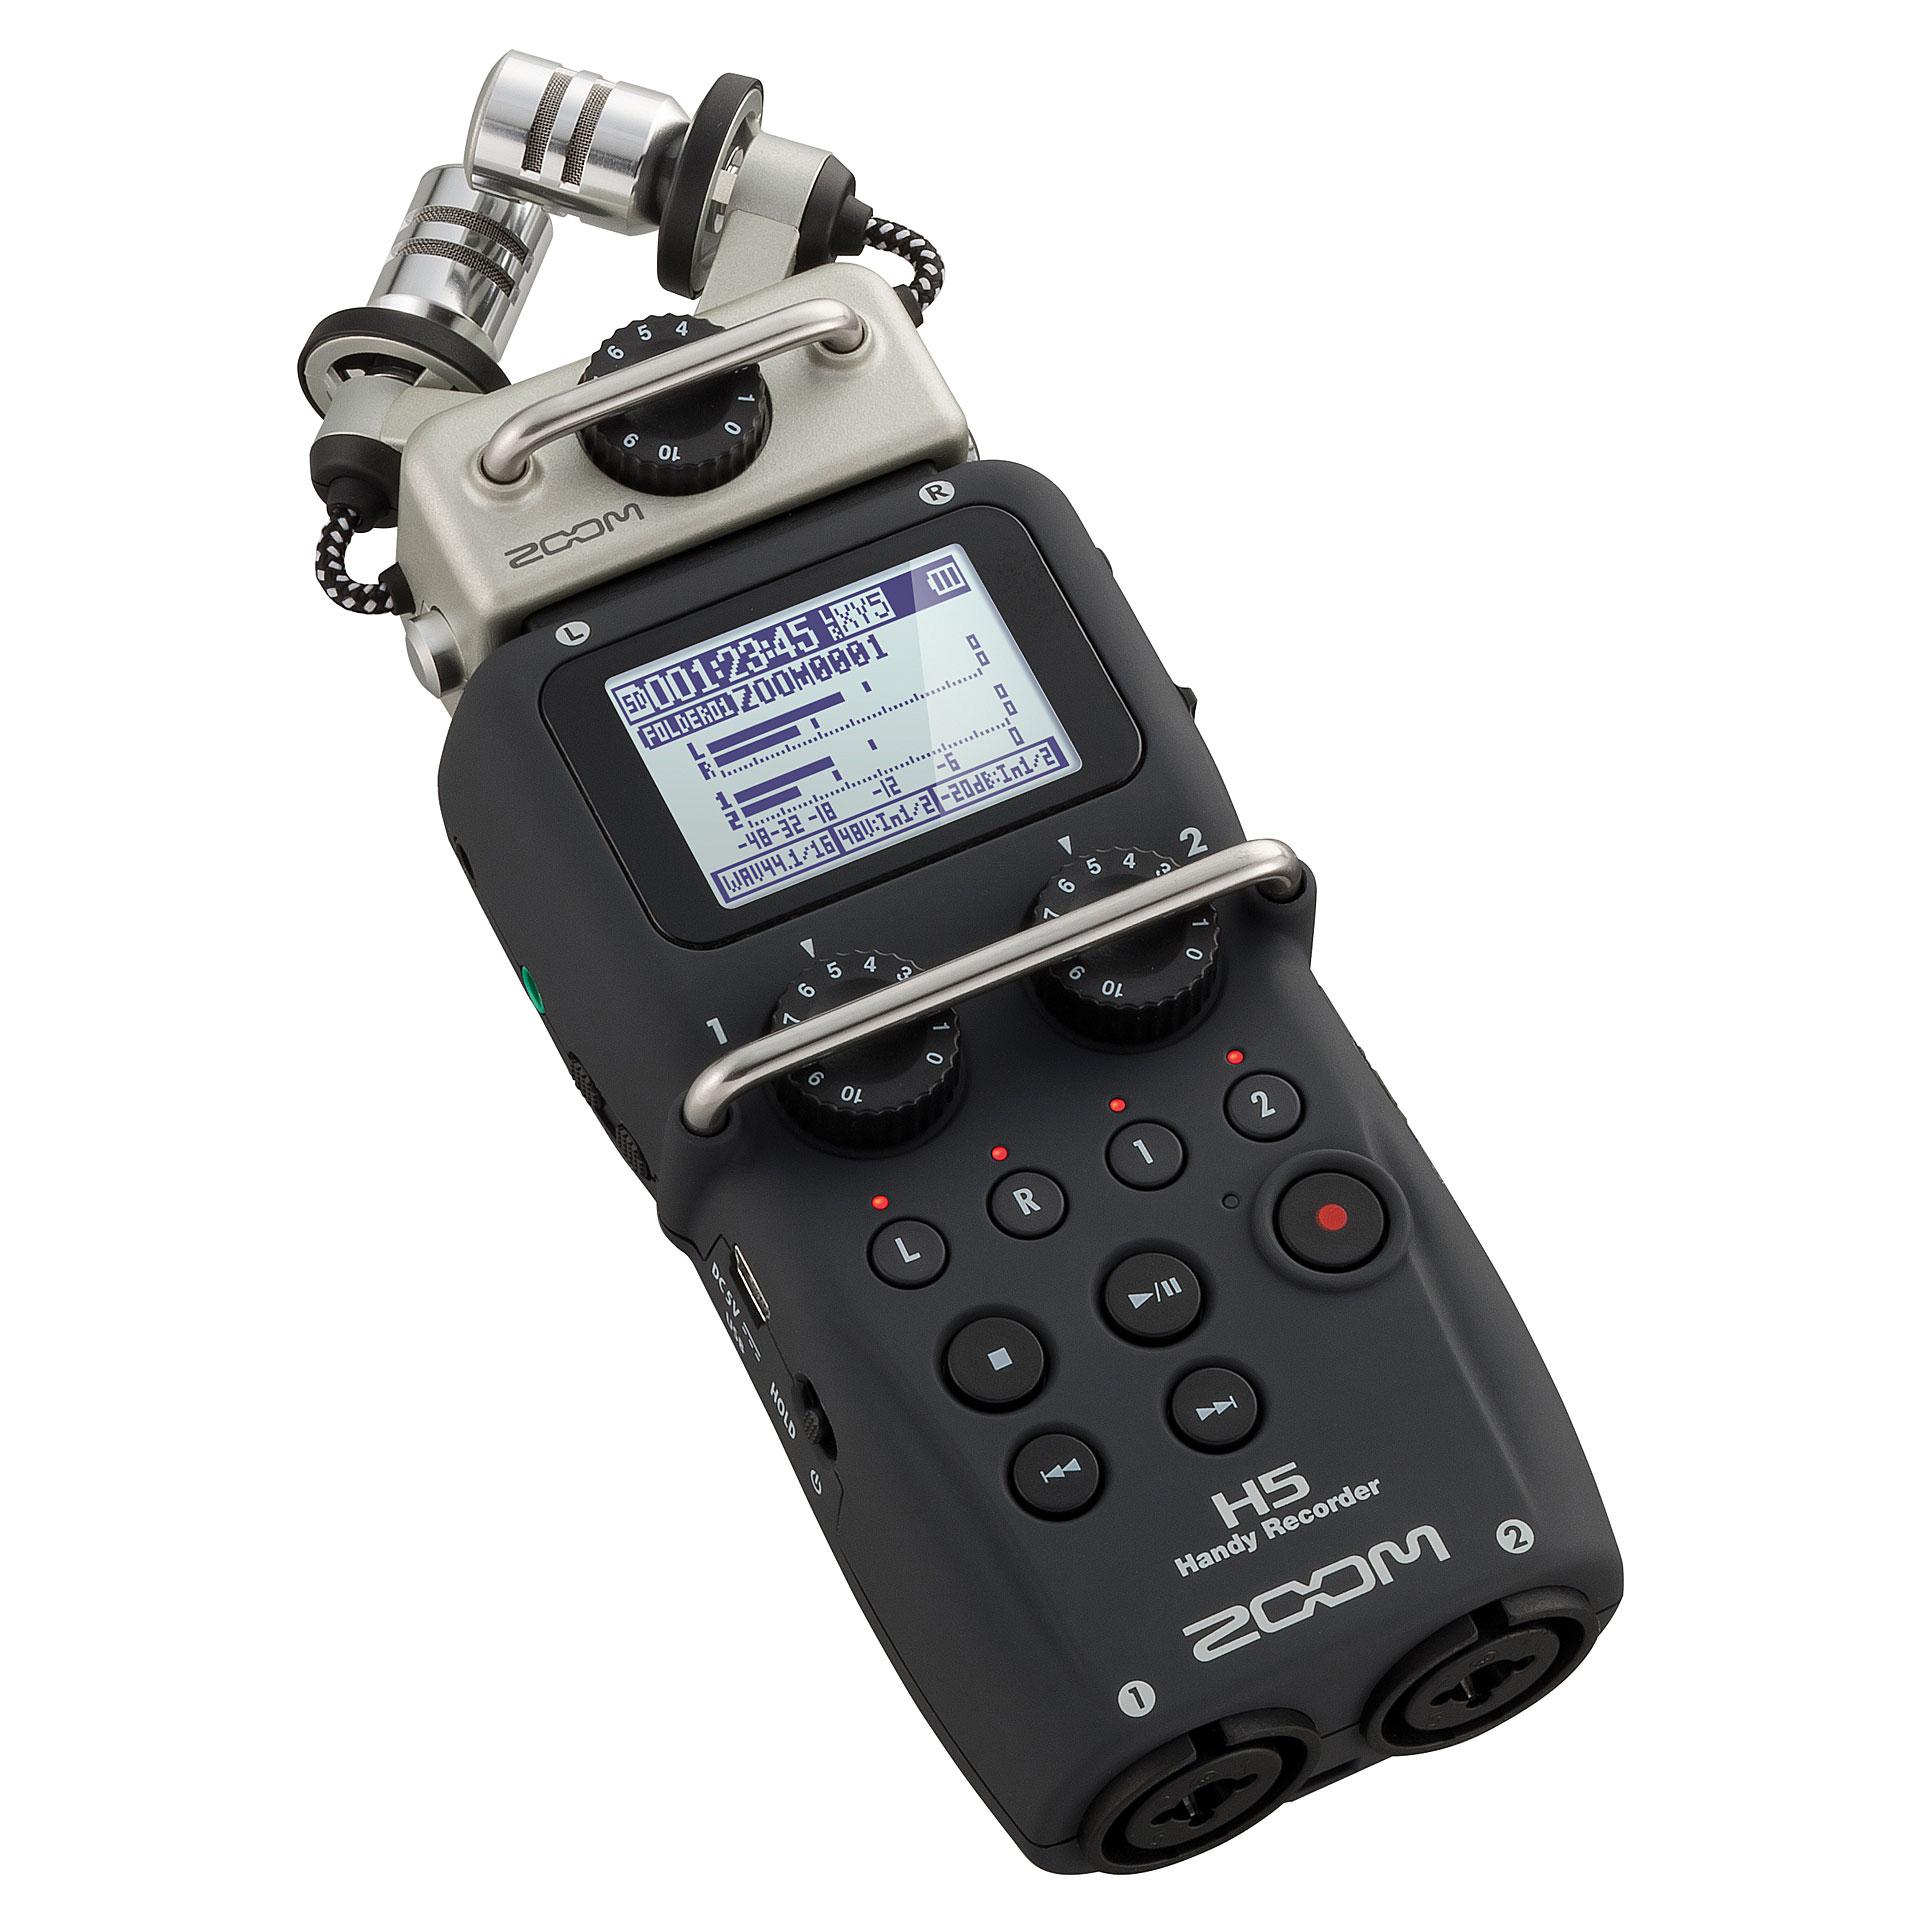 Zoom H5 Digital Recorder – Camerakit ie